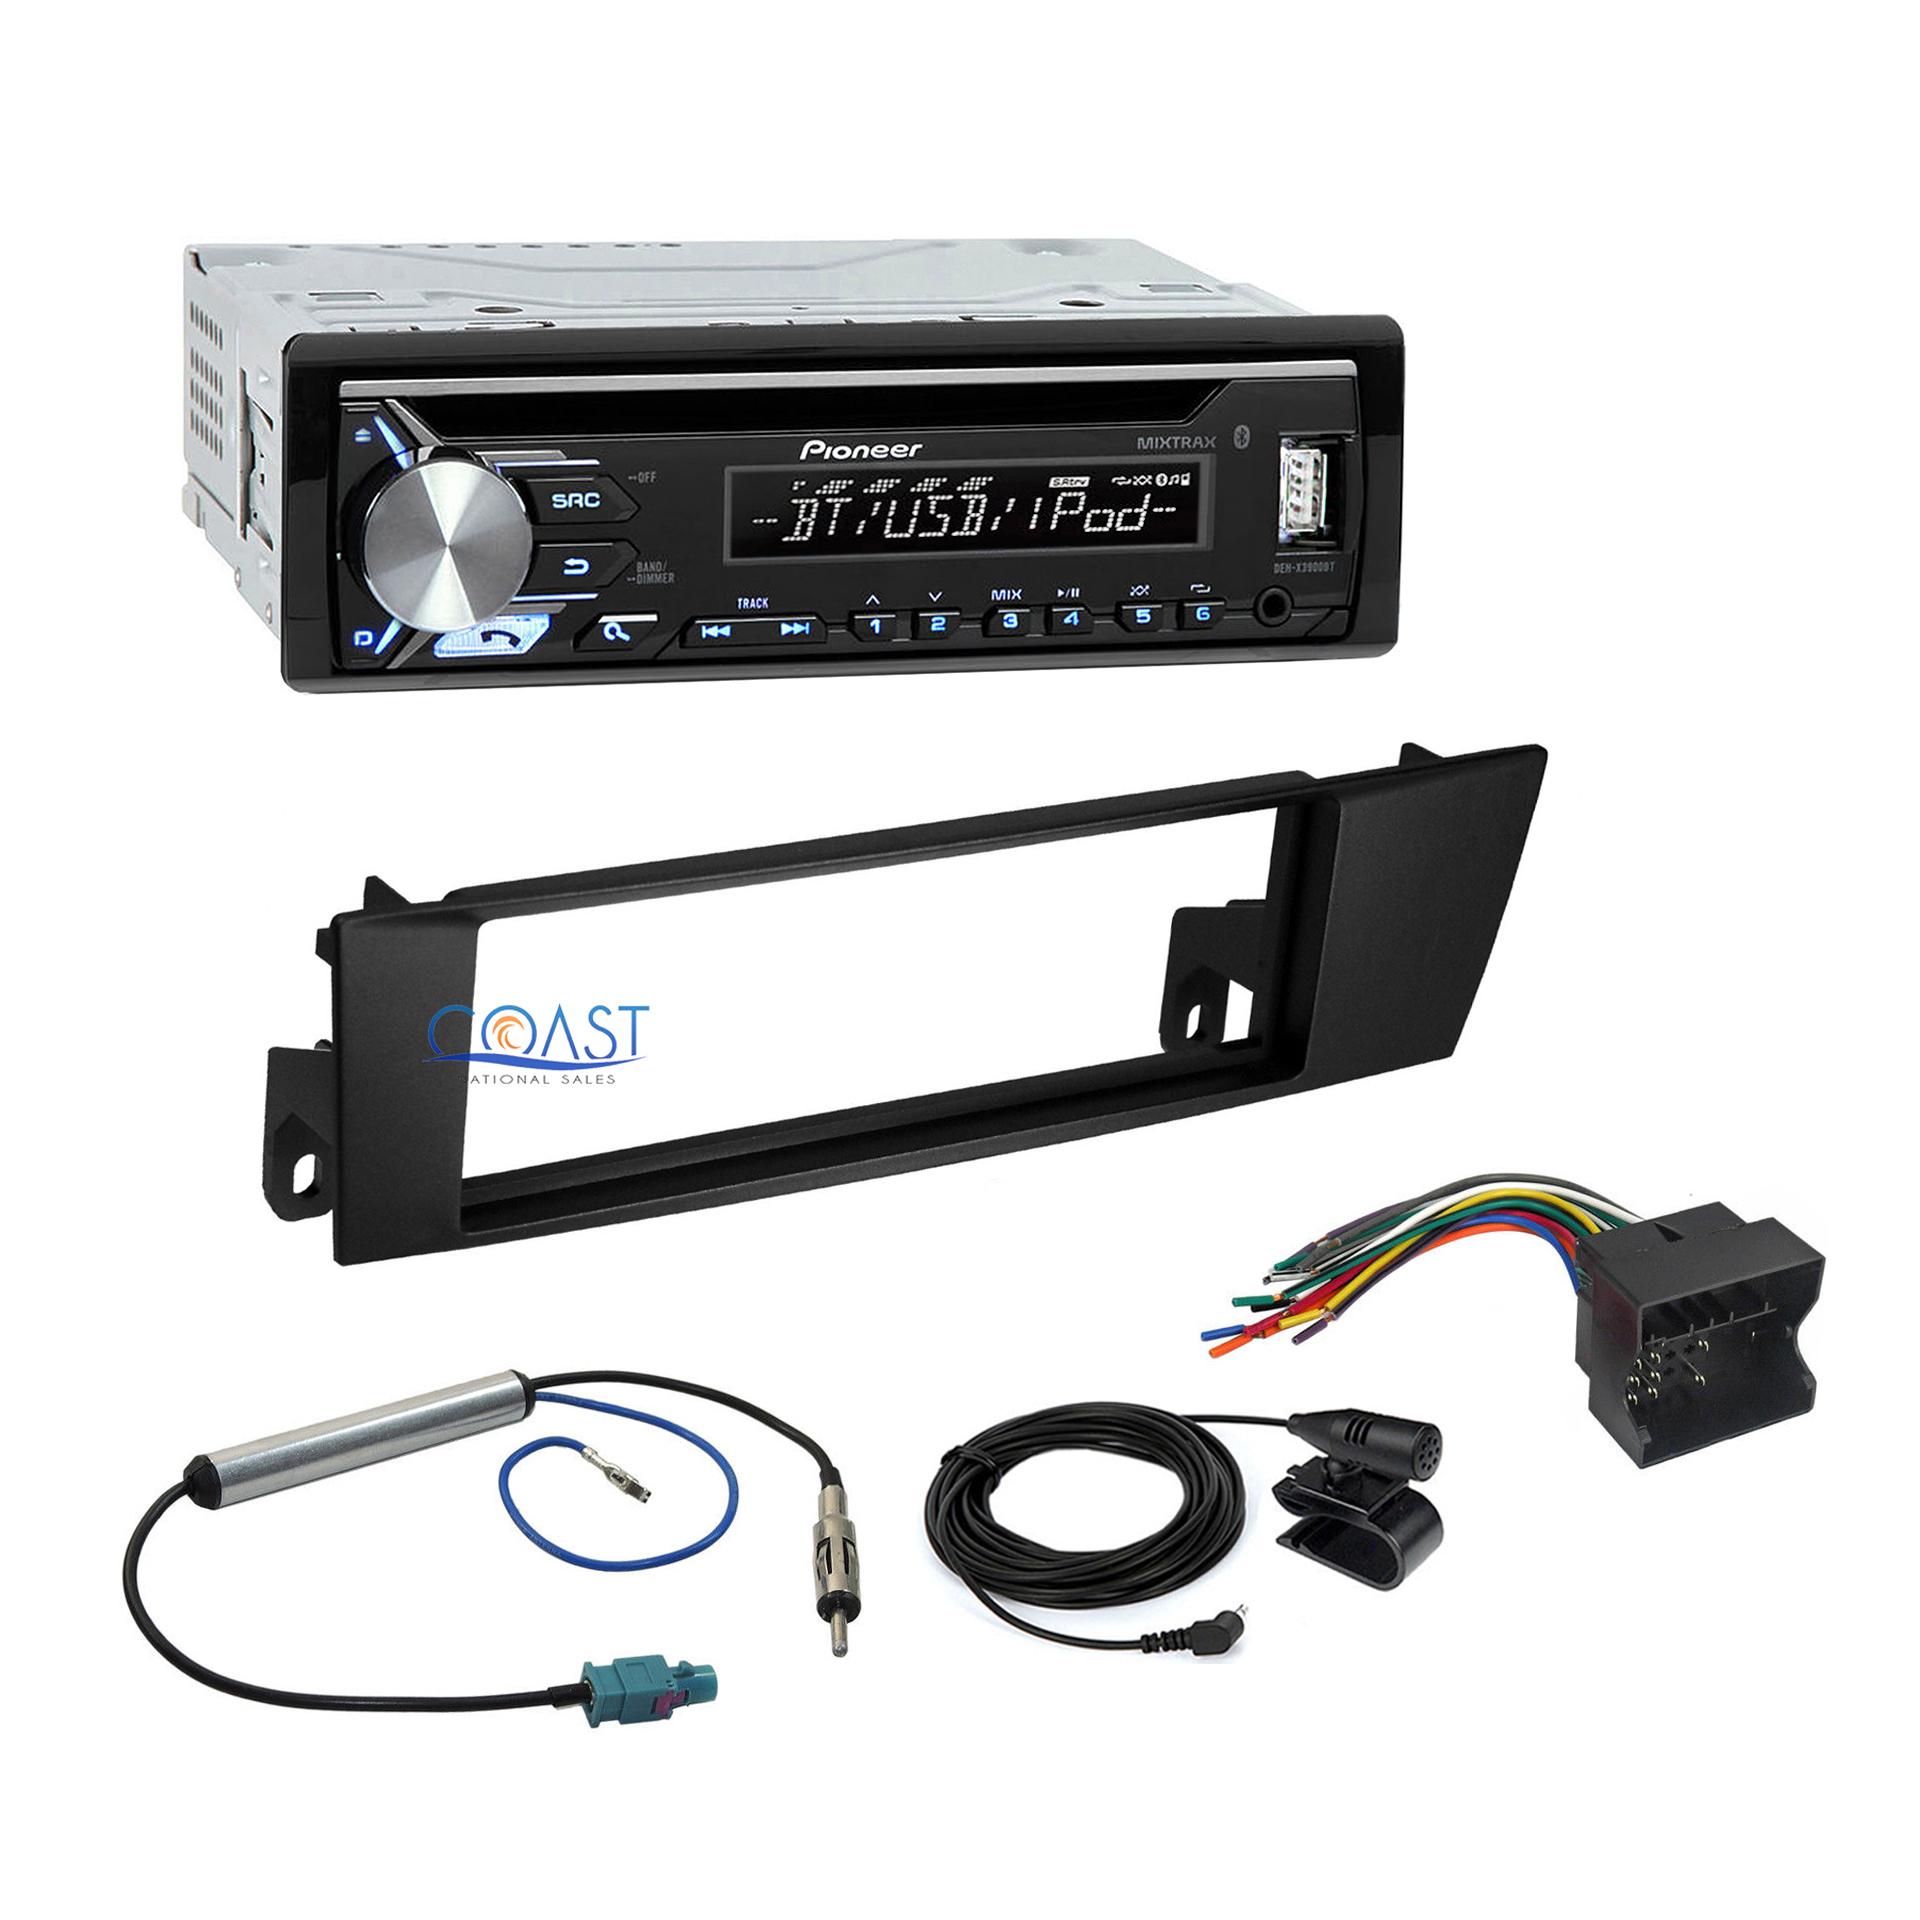 Pioneer Car Radio Stereo Single Din Dash Kit Harness for 2003-06 Dodge Sprinter